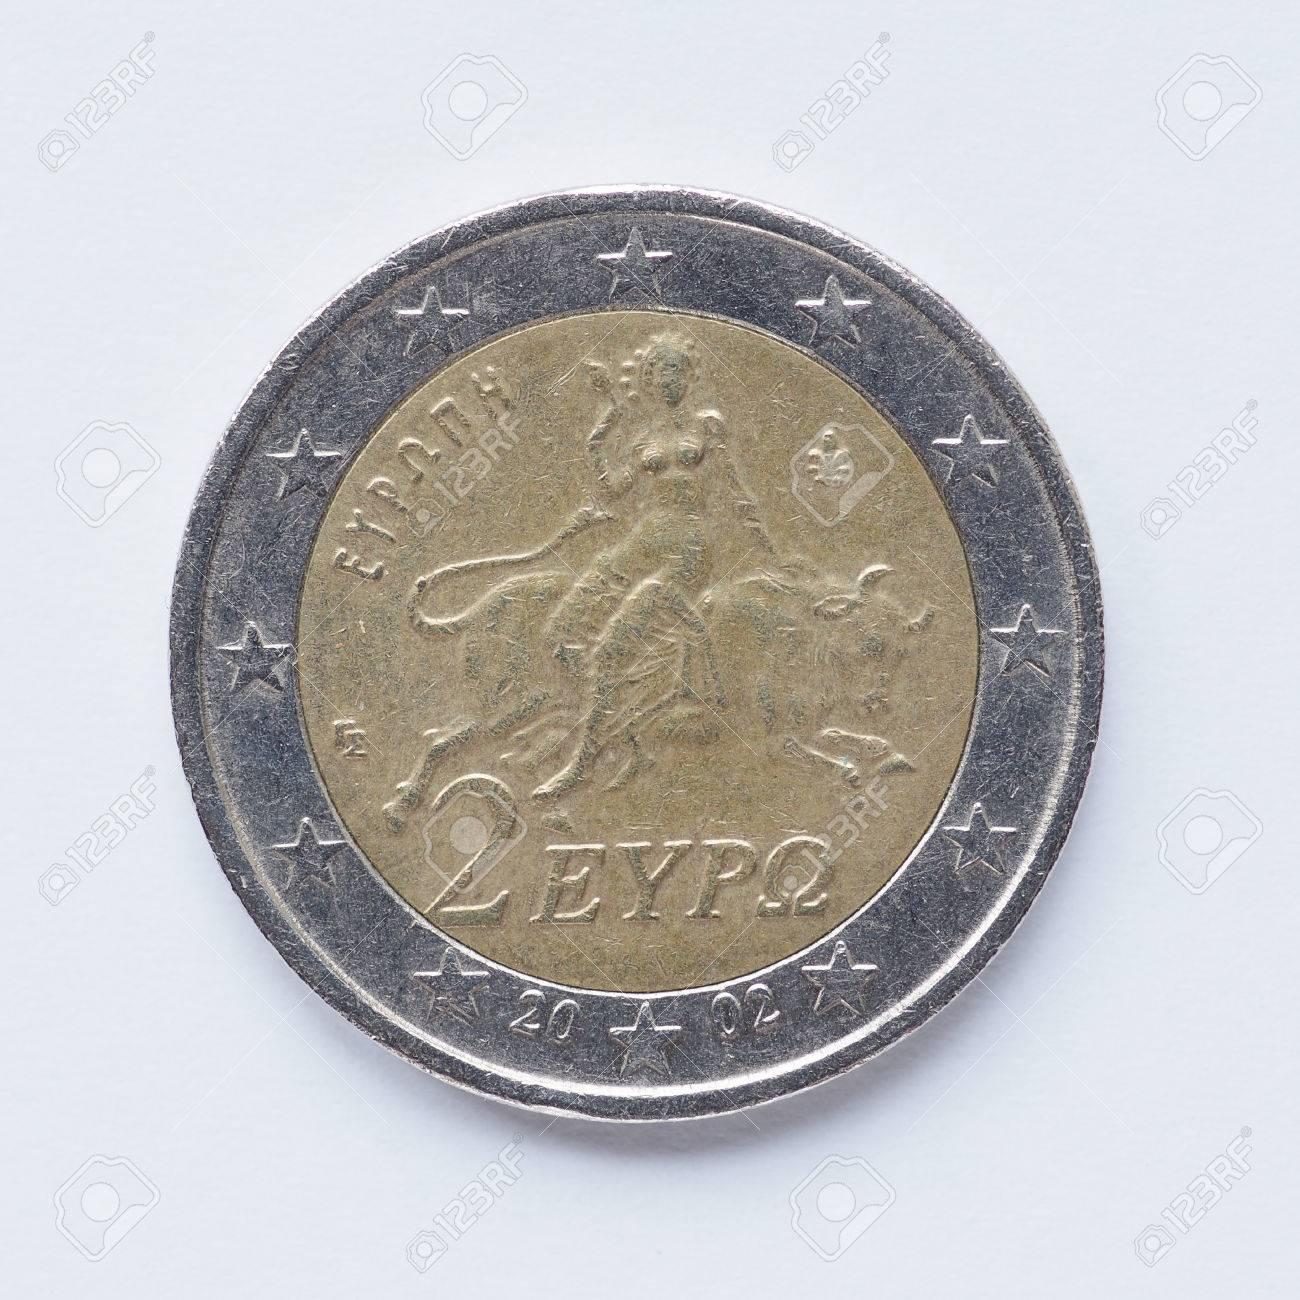 Währung Europas 2 Euro Münze Aus Griechenland Lizenzfreie Fotos